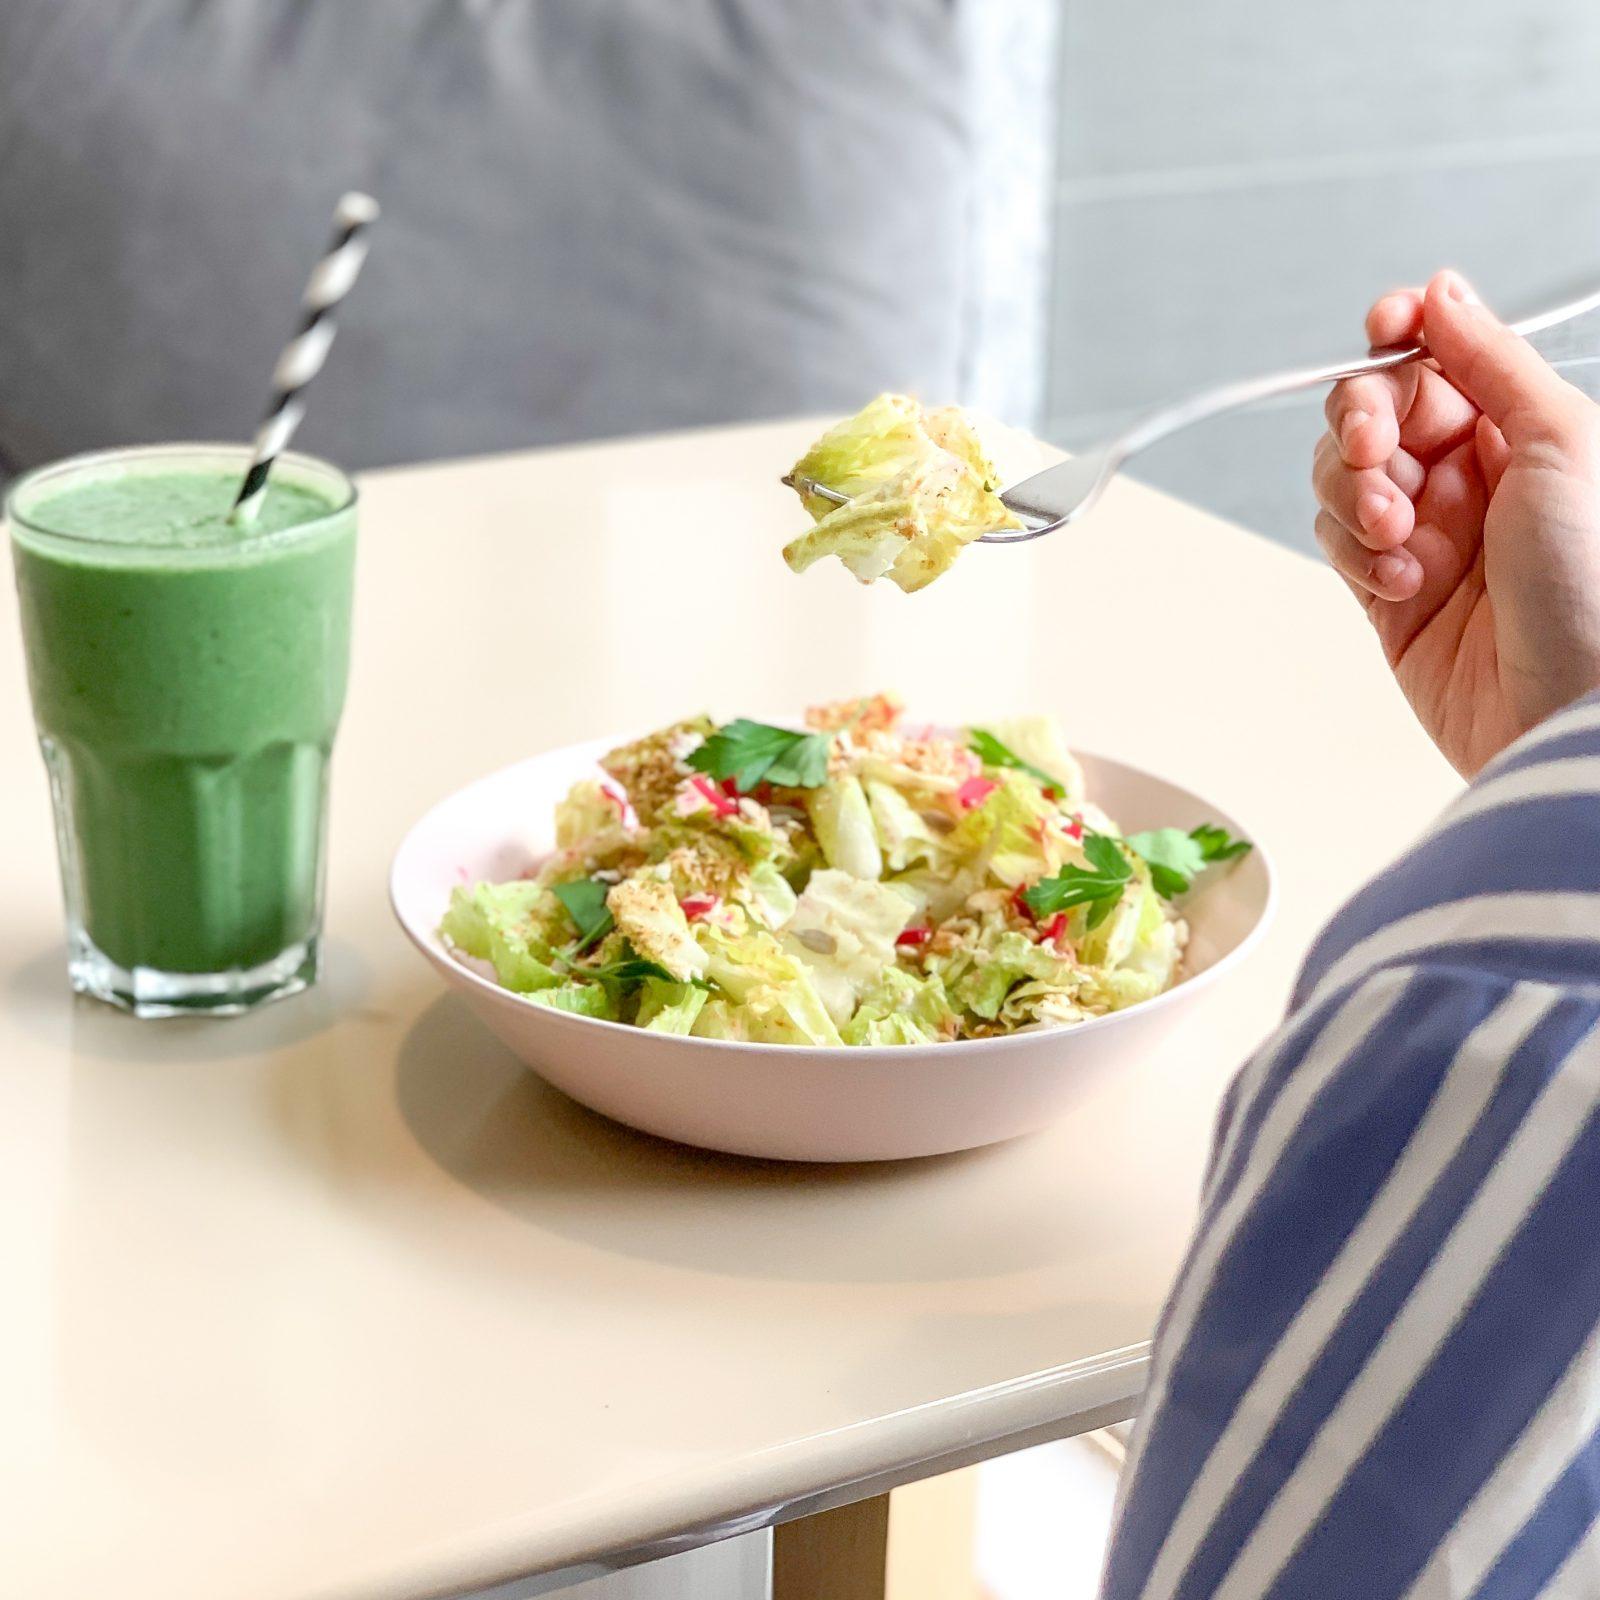 Brambles vegan salad and smoothie